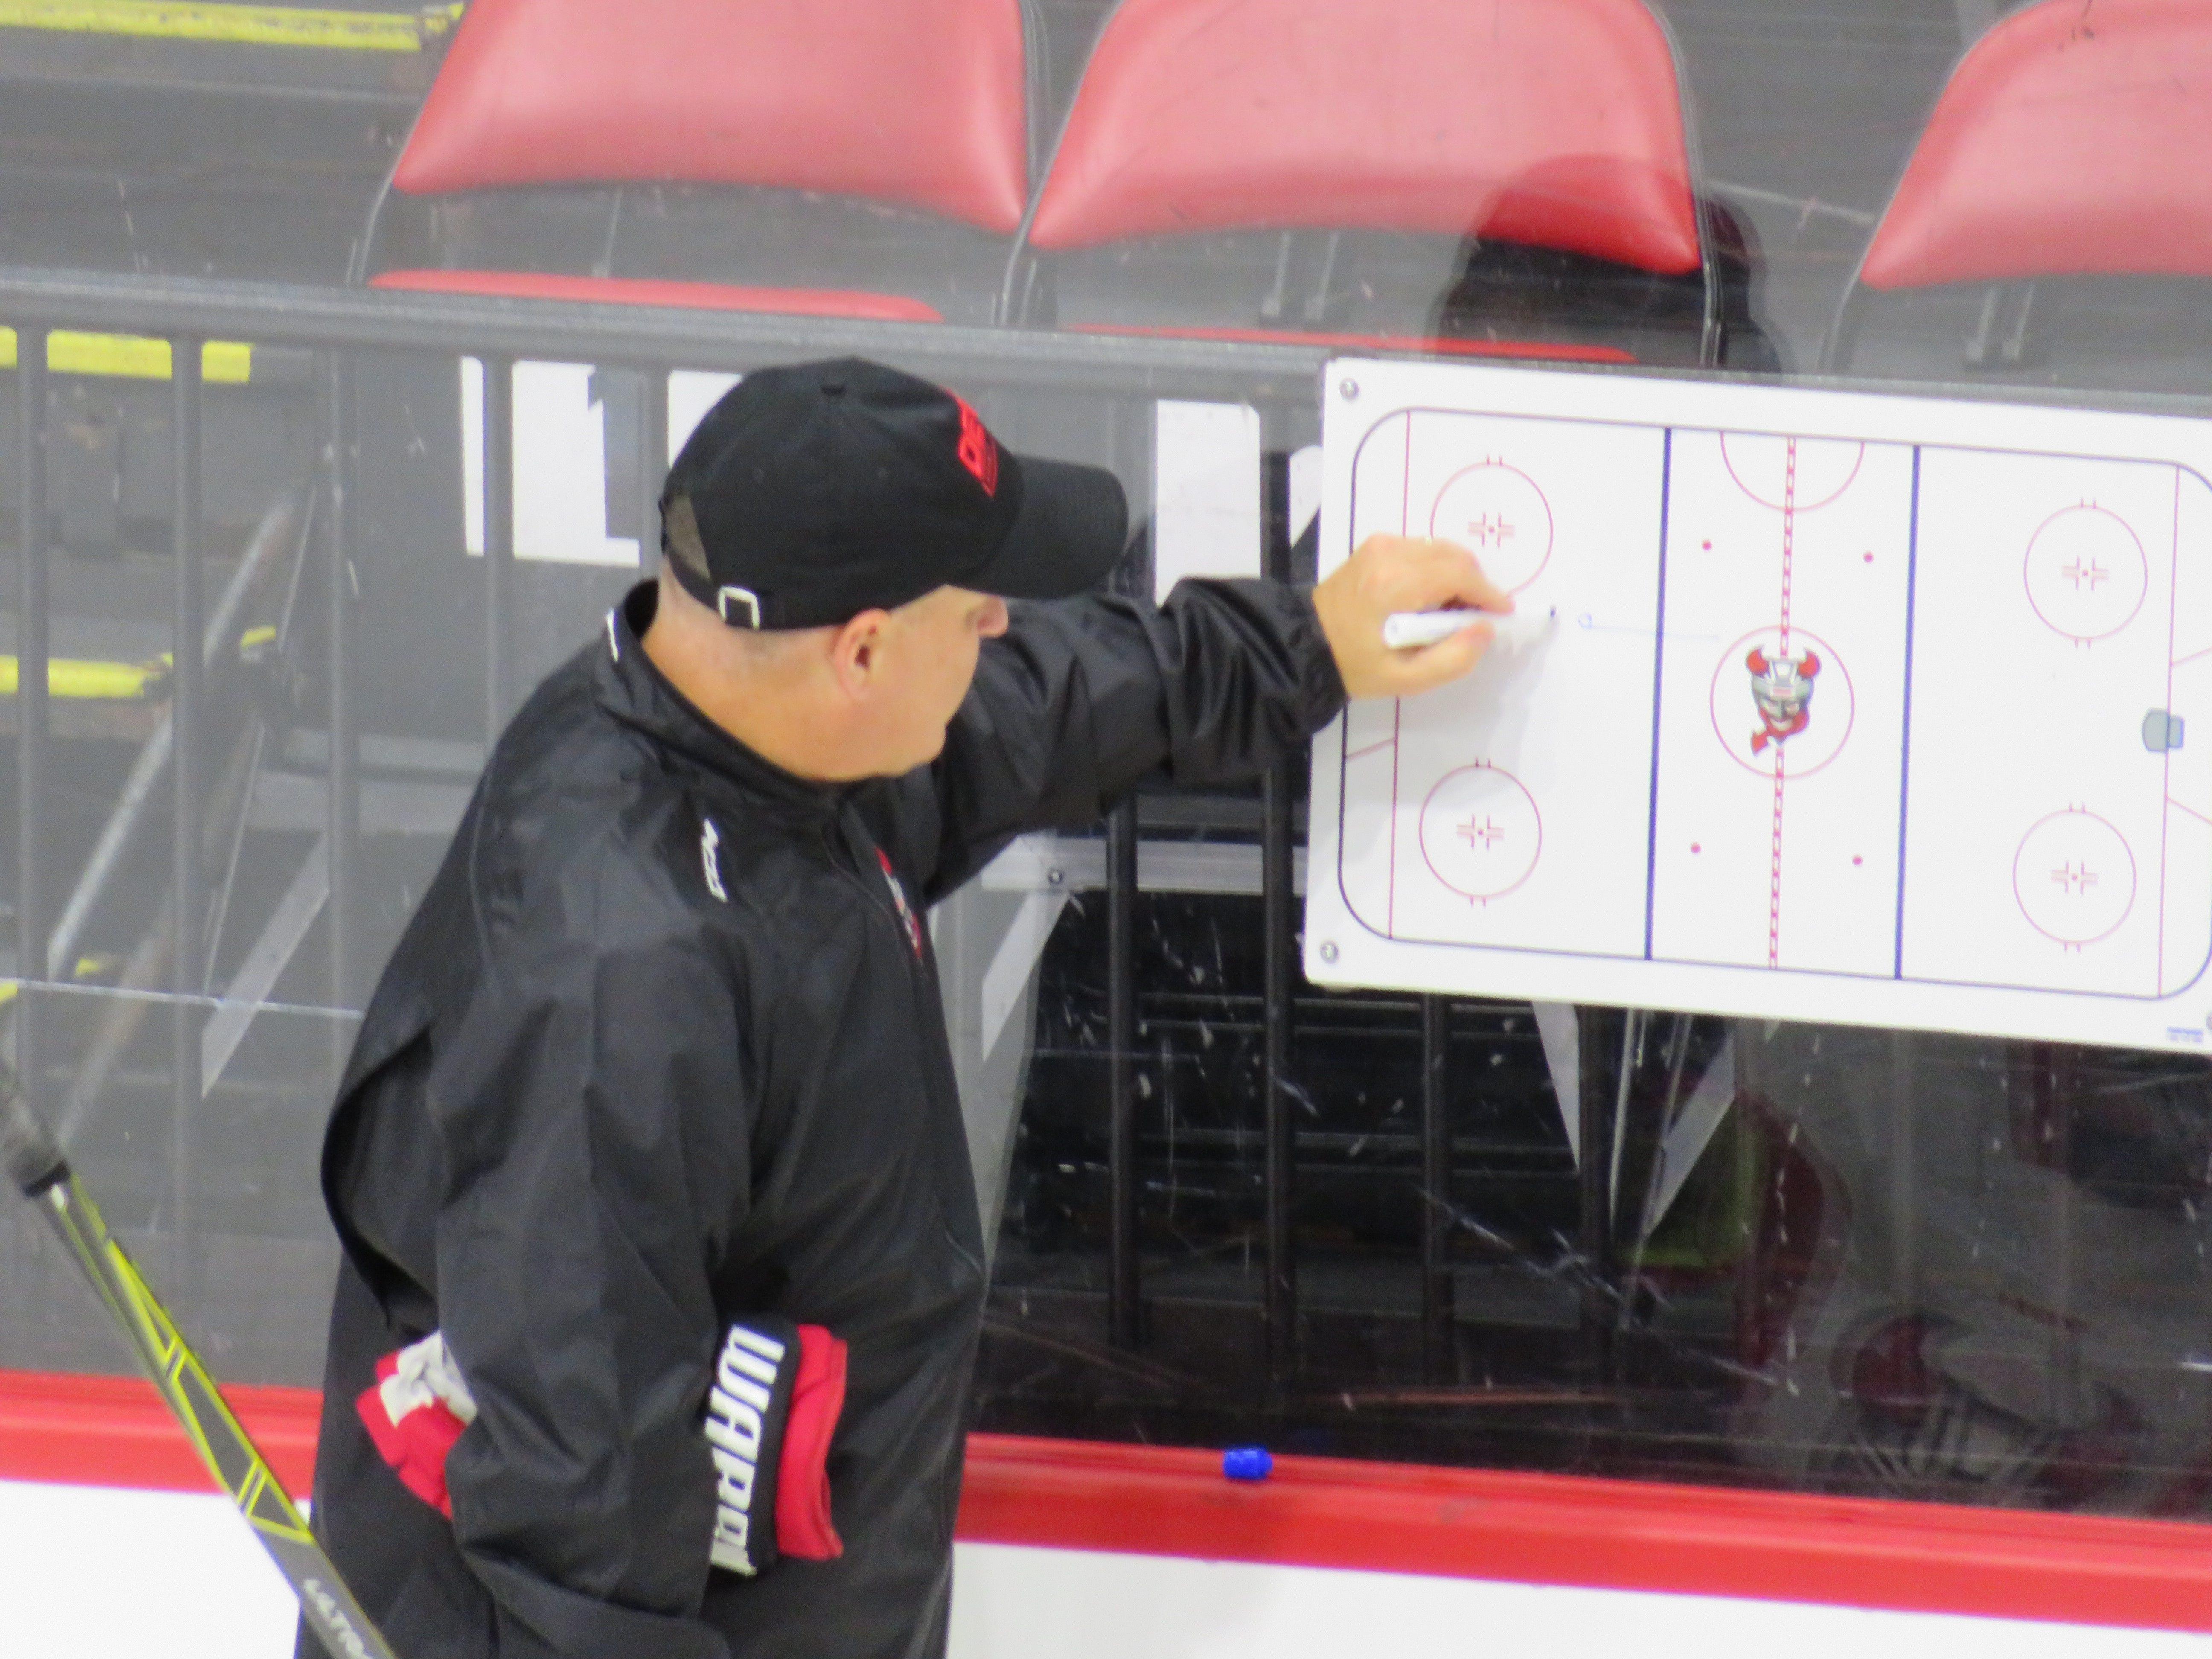 Poor attendance, results define Binghamton Devils' season